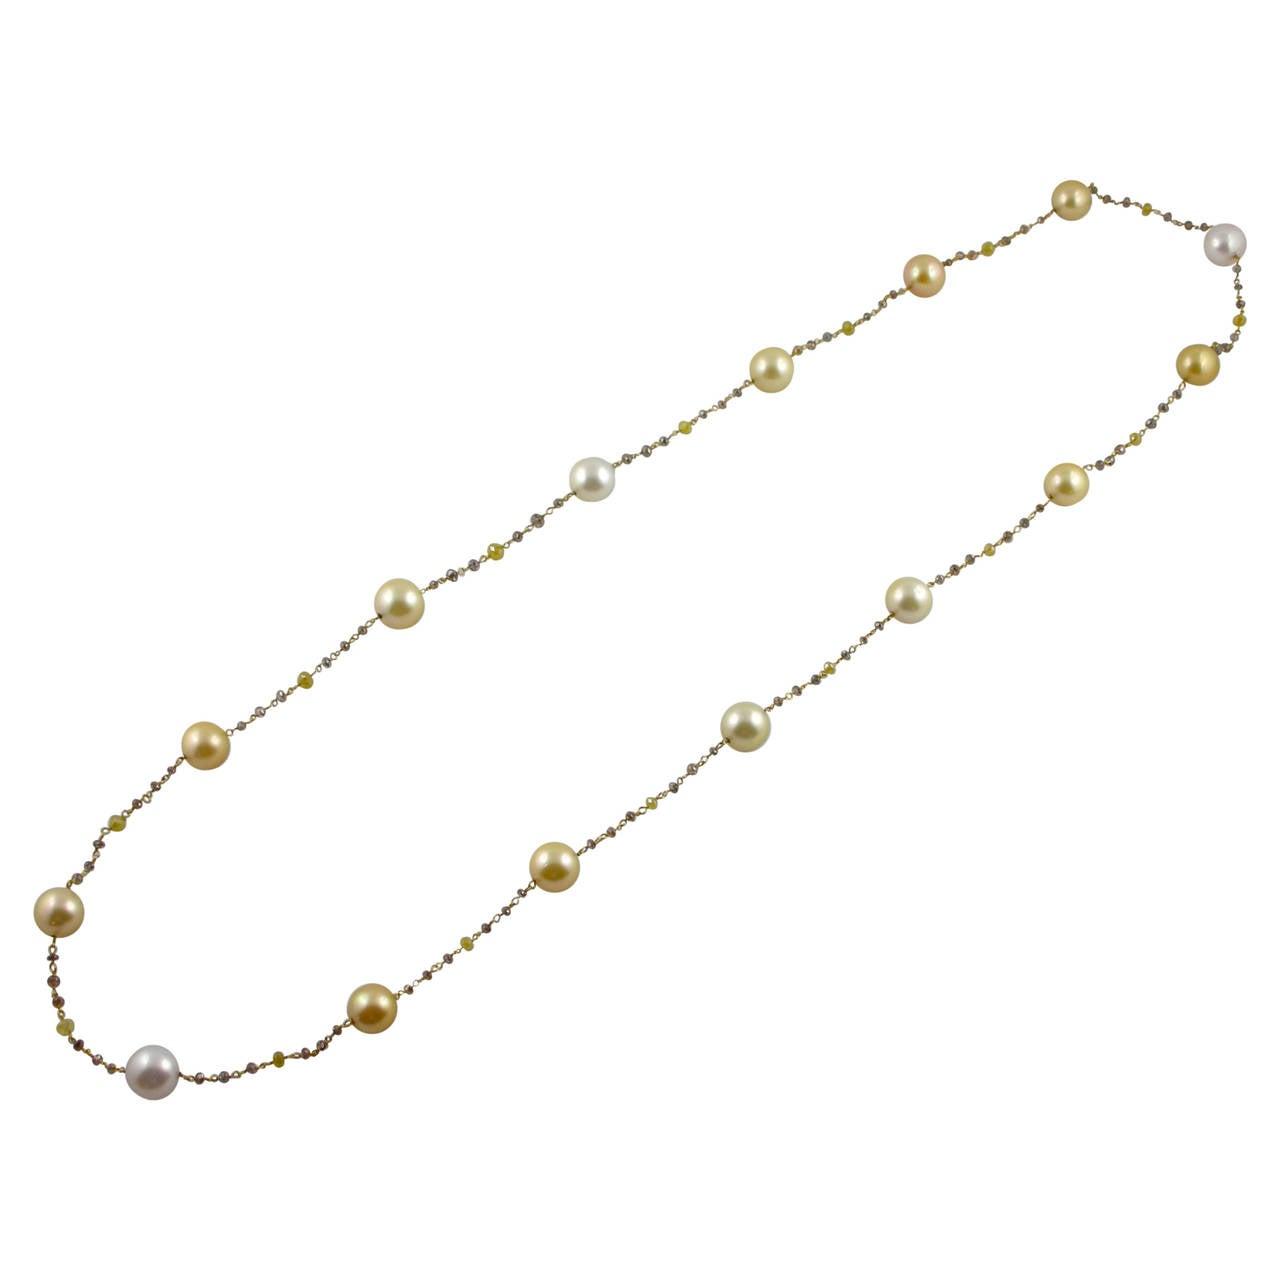 Jona South Sea Pearl Briolette Cut Diamond Sautoir 18 Karat Yellow Gold Necklace For Sale